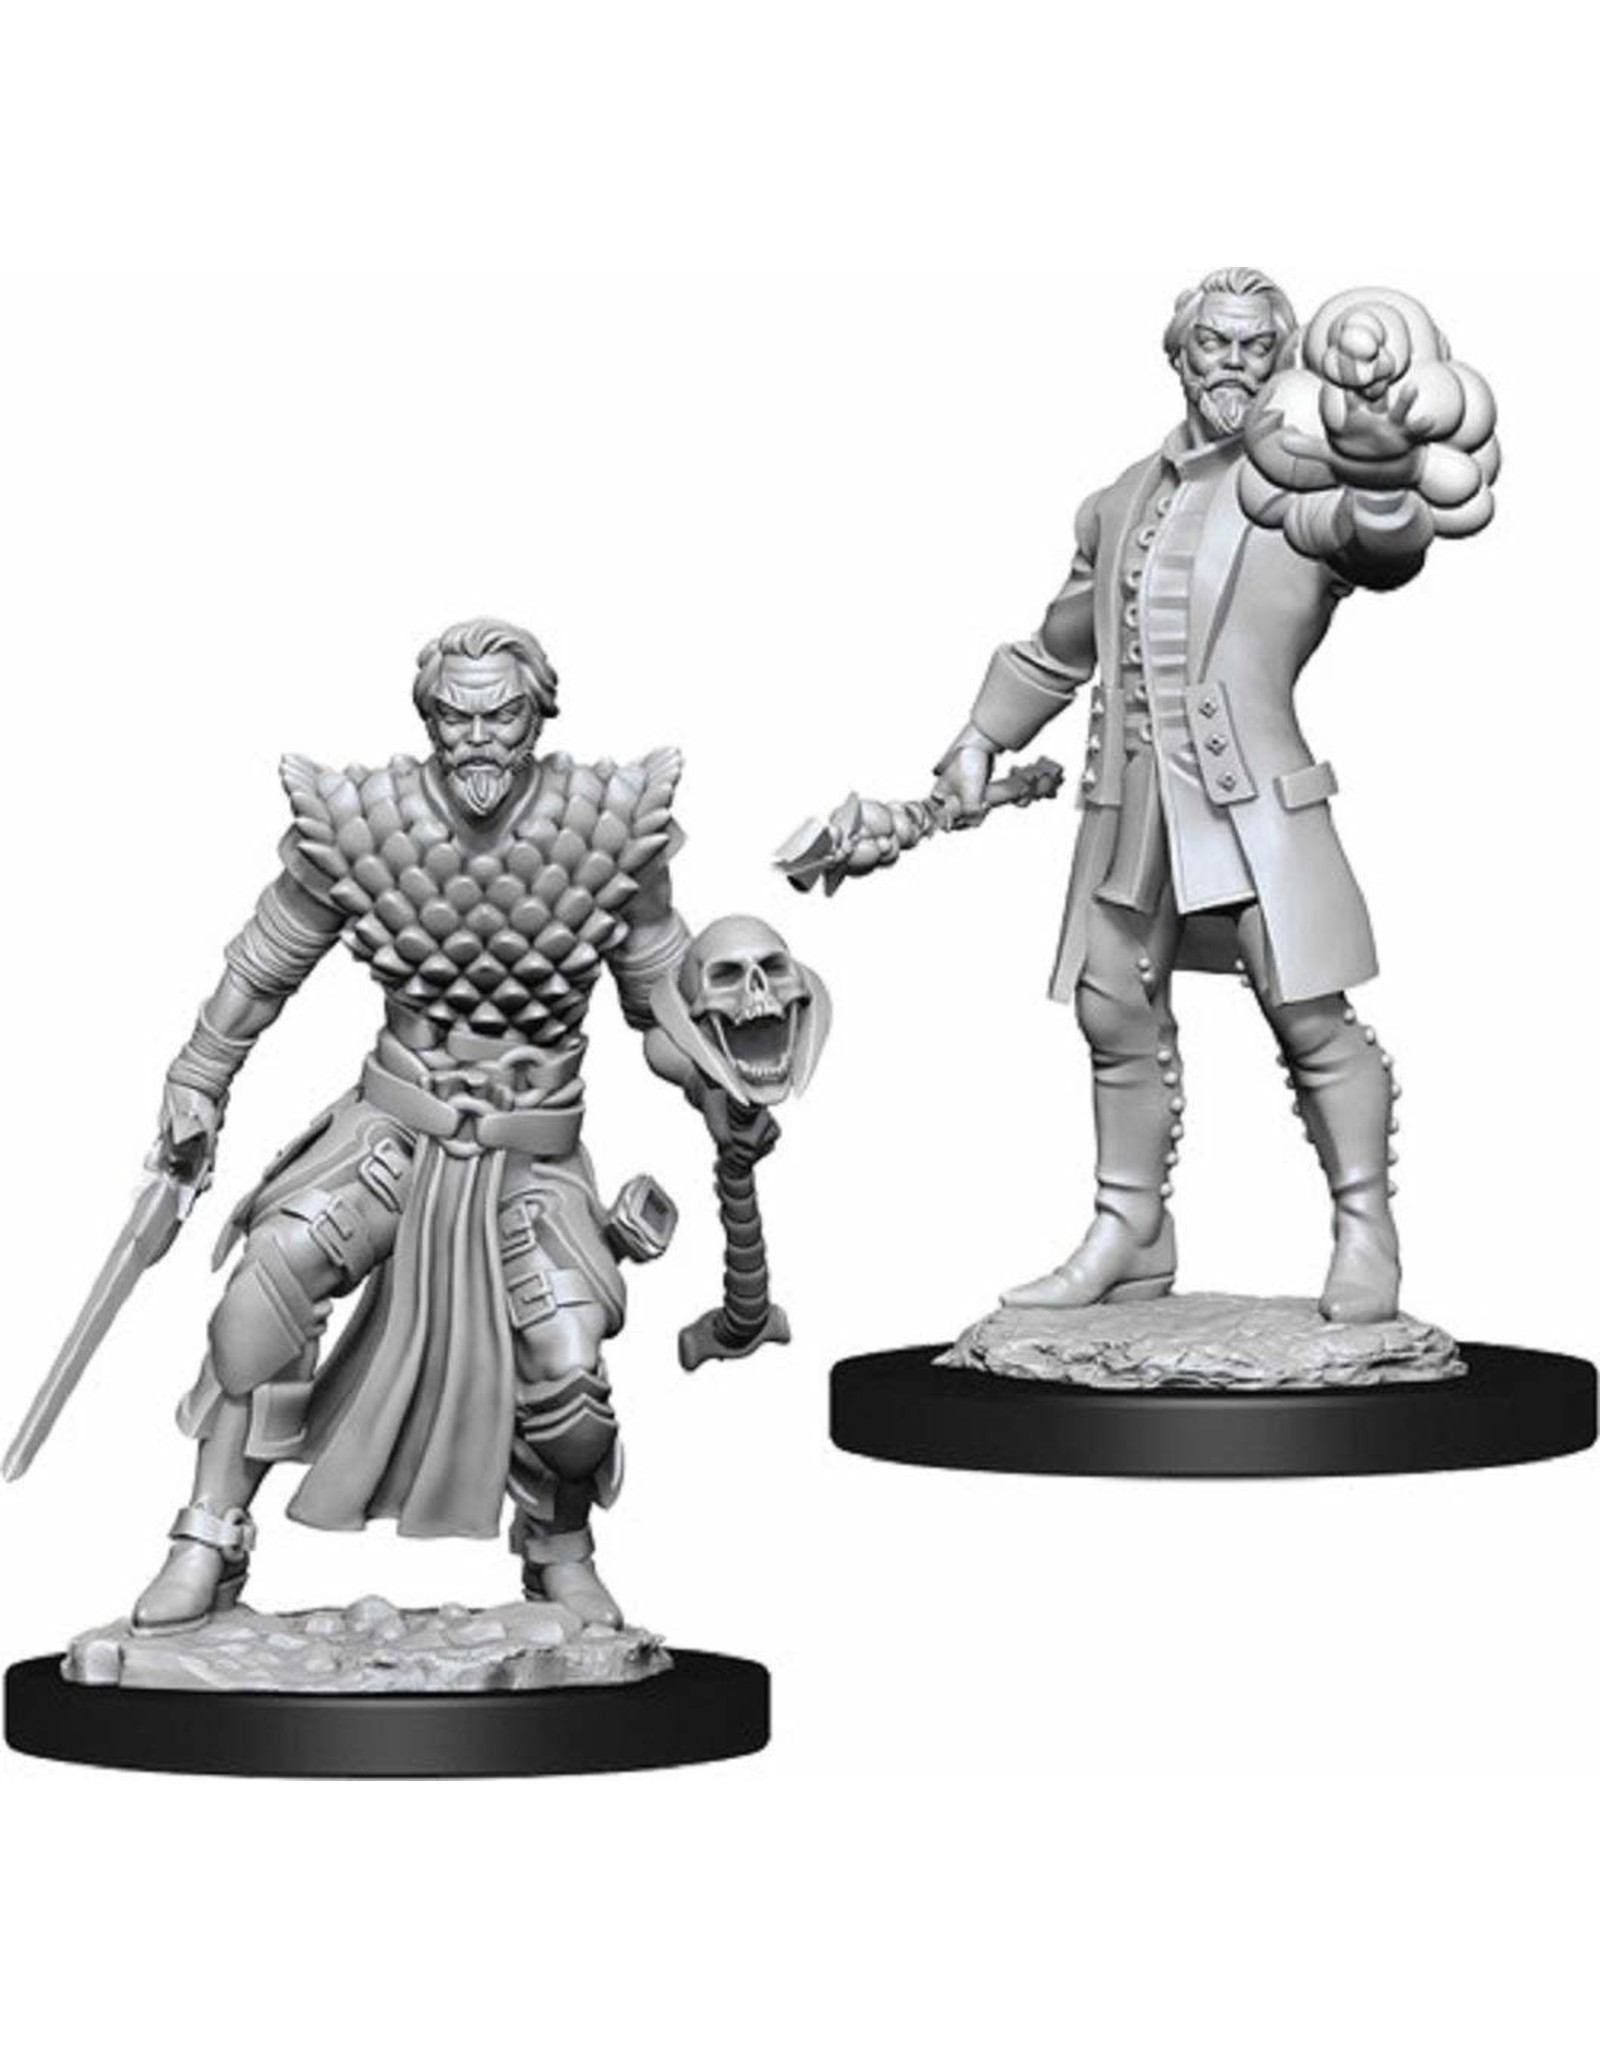 Wizkids Dungeons & Dragons Nolzur's Marvelous Unpainted Miniatures: W10 Male Human Warlock